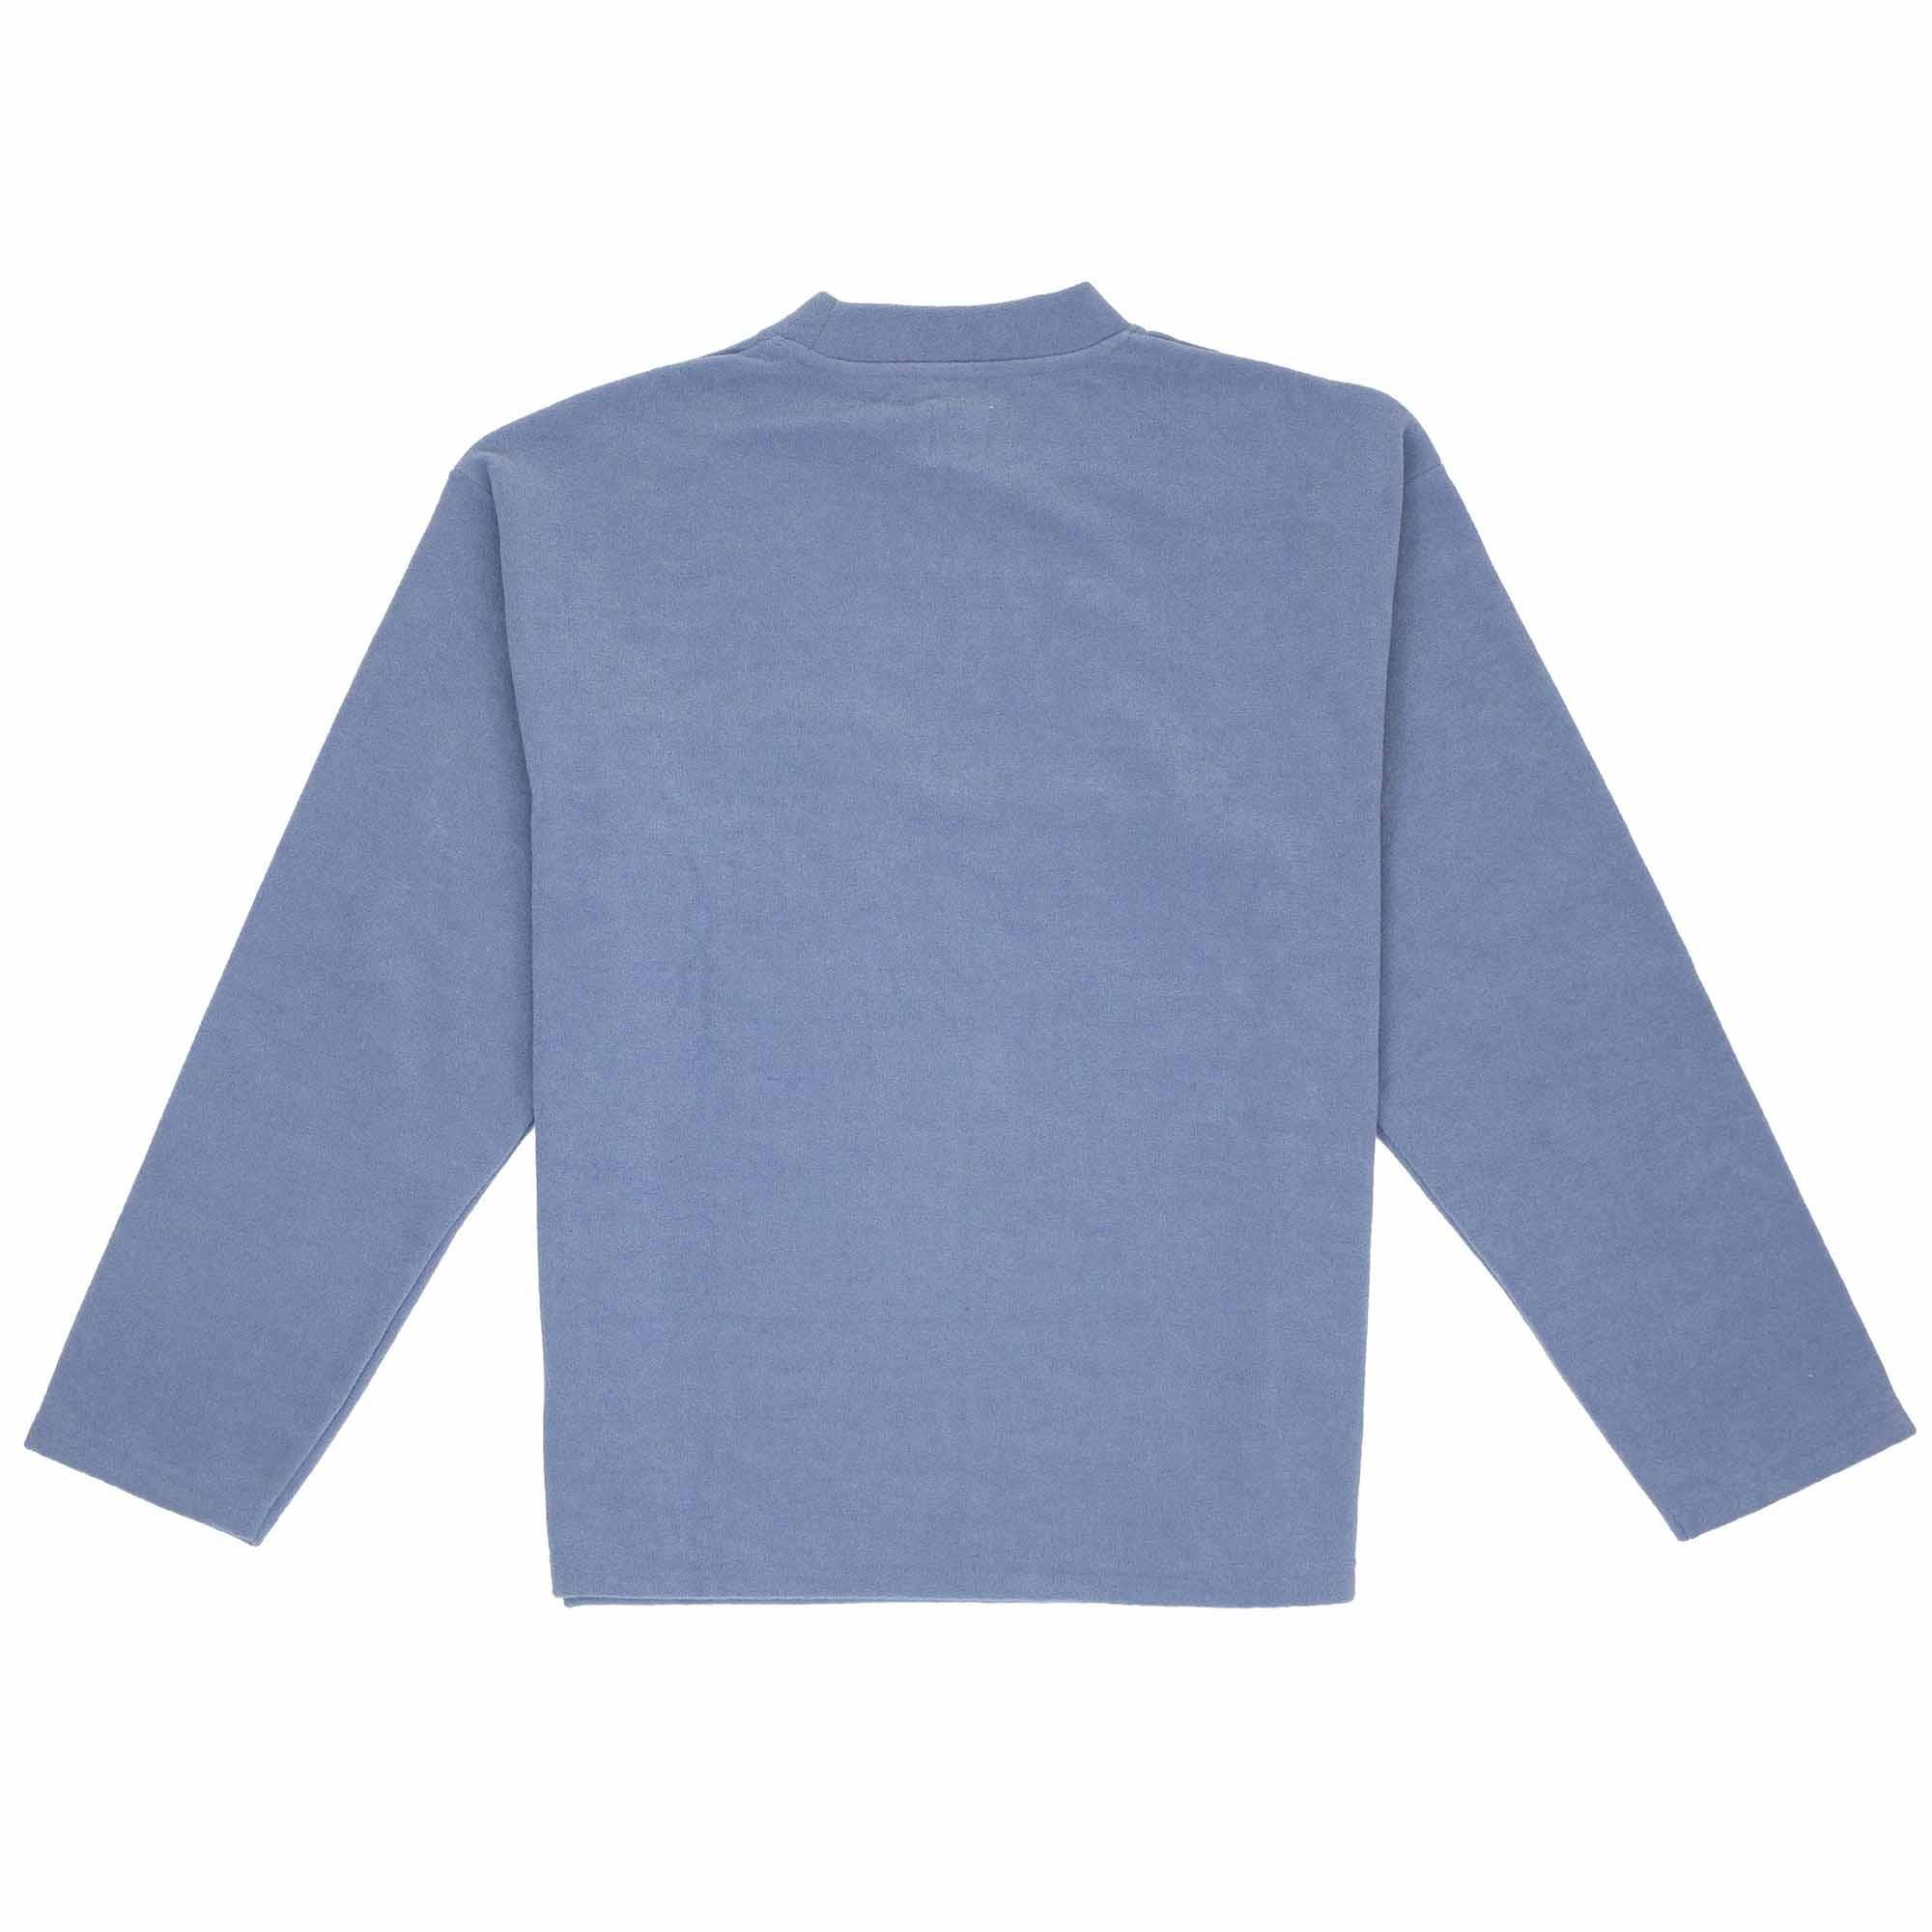 Polar Skate Co. Terry Pullover - Sky Blue